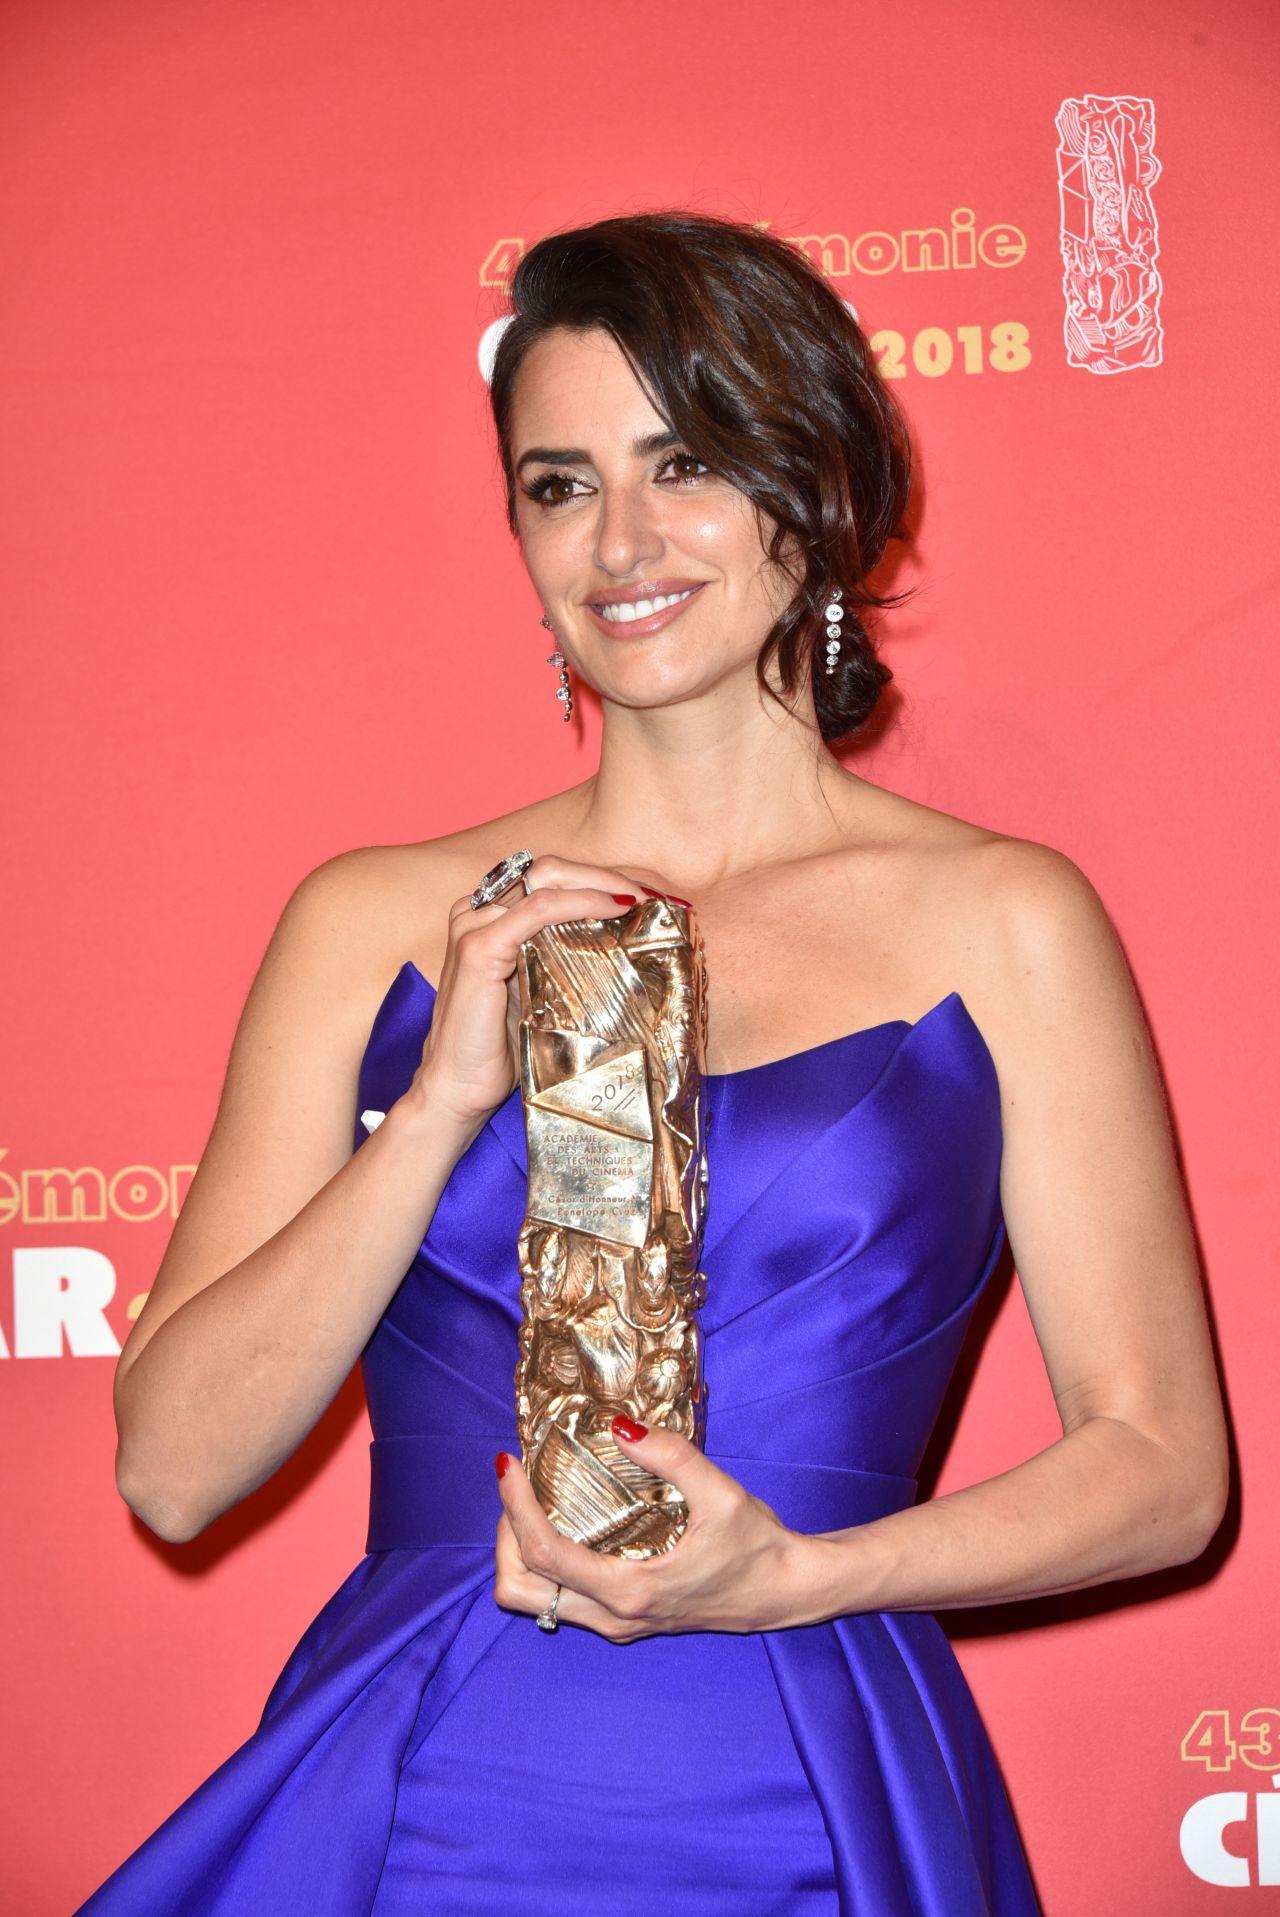 http://celebmafia.com/wp-content/uploads/2018/03/penelope-cruz-cesar-film-awards-2018-in-paris-9.jpg